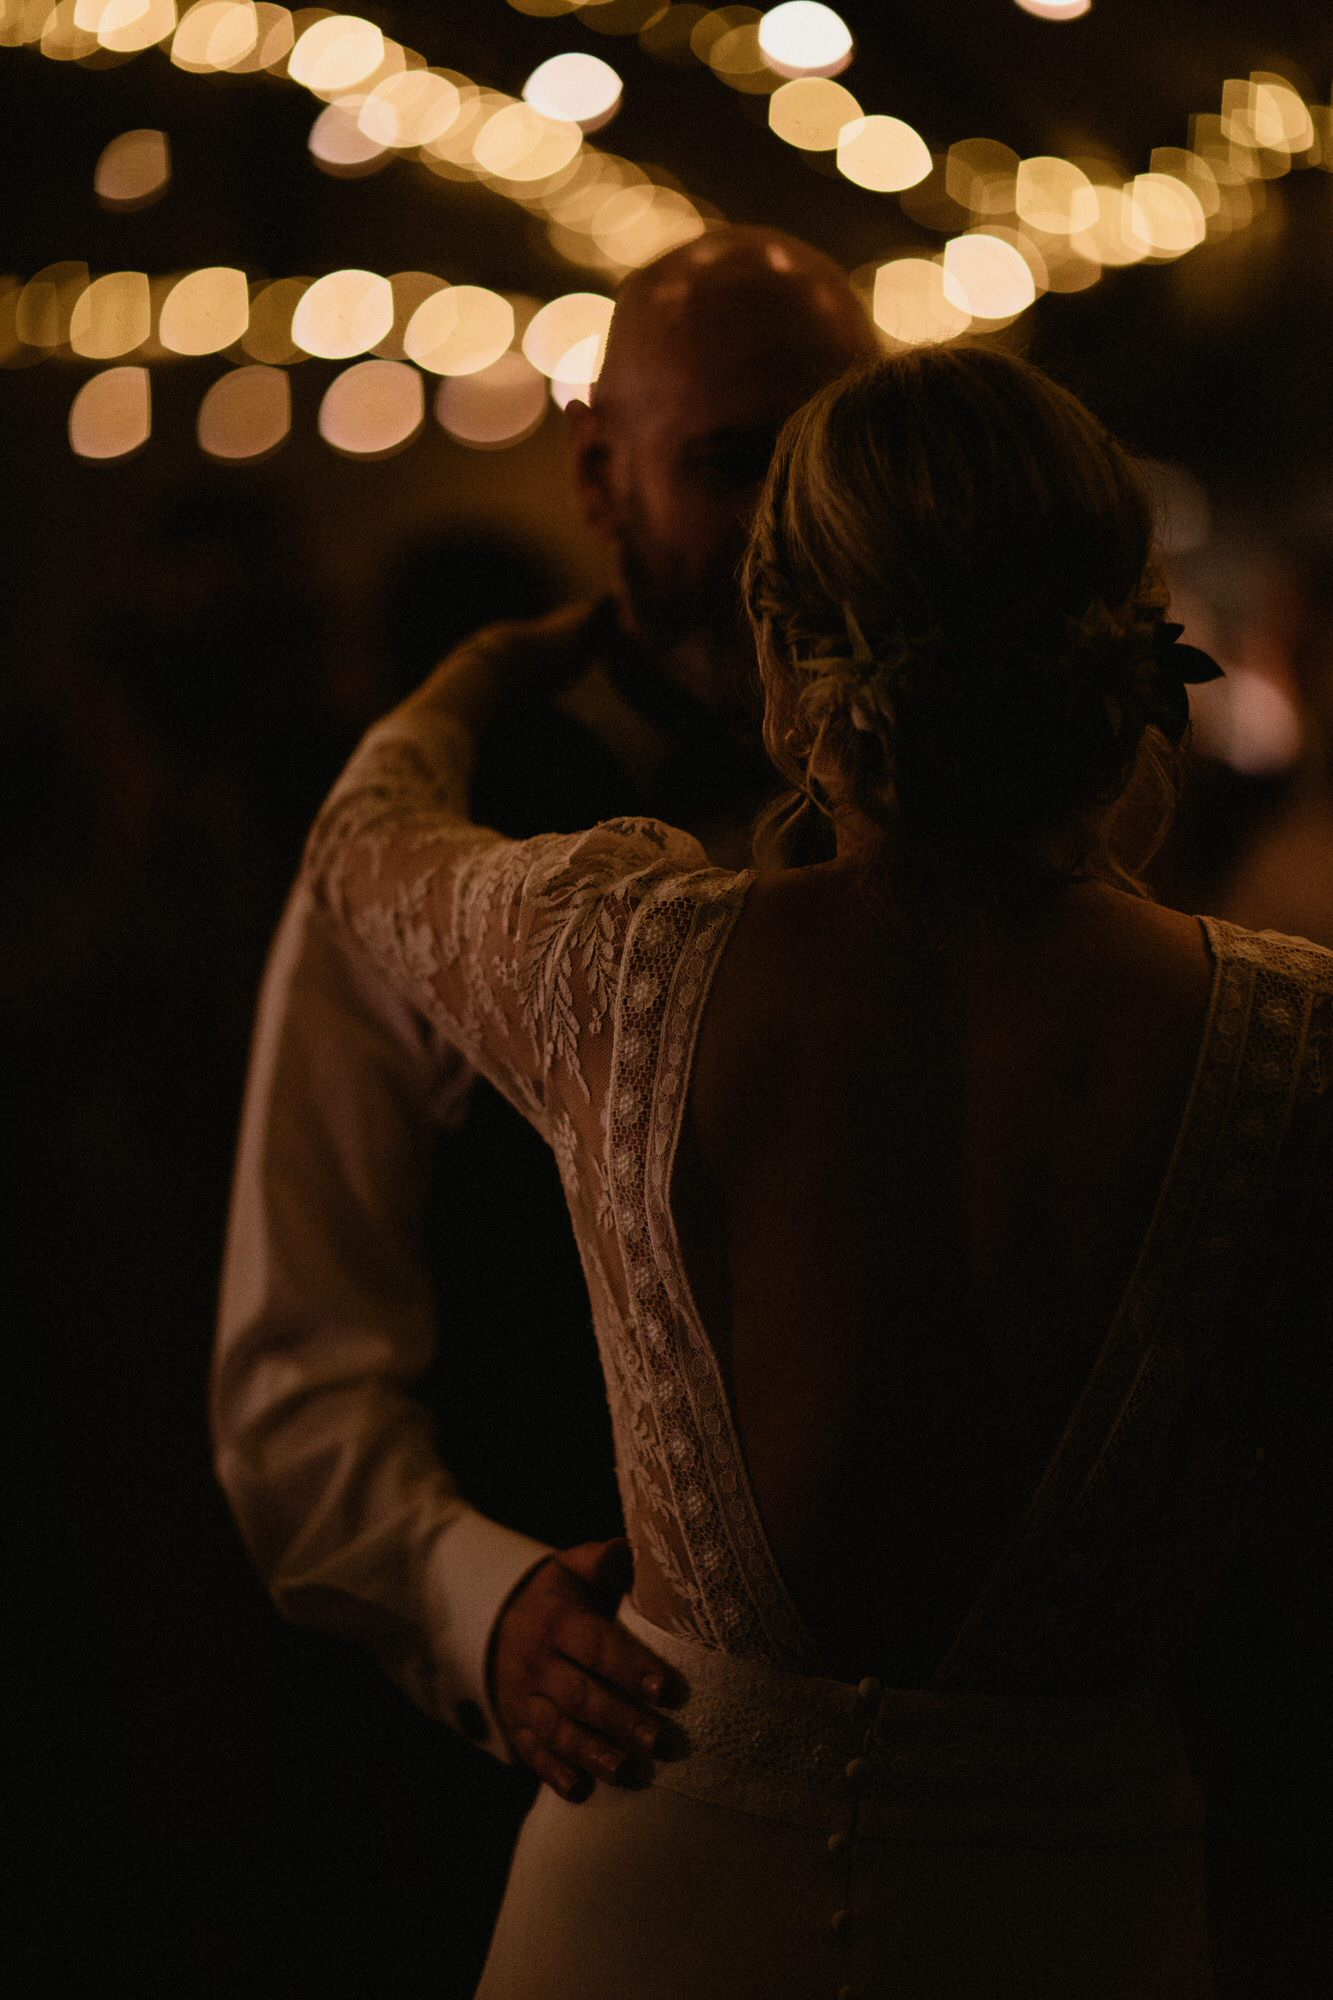 077 TIN SHED KNOCKRAICH WEDDING AUTUMN ZOE ALEXANDRA PHOTOGRAPHY